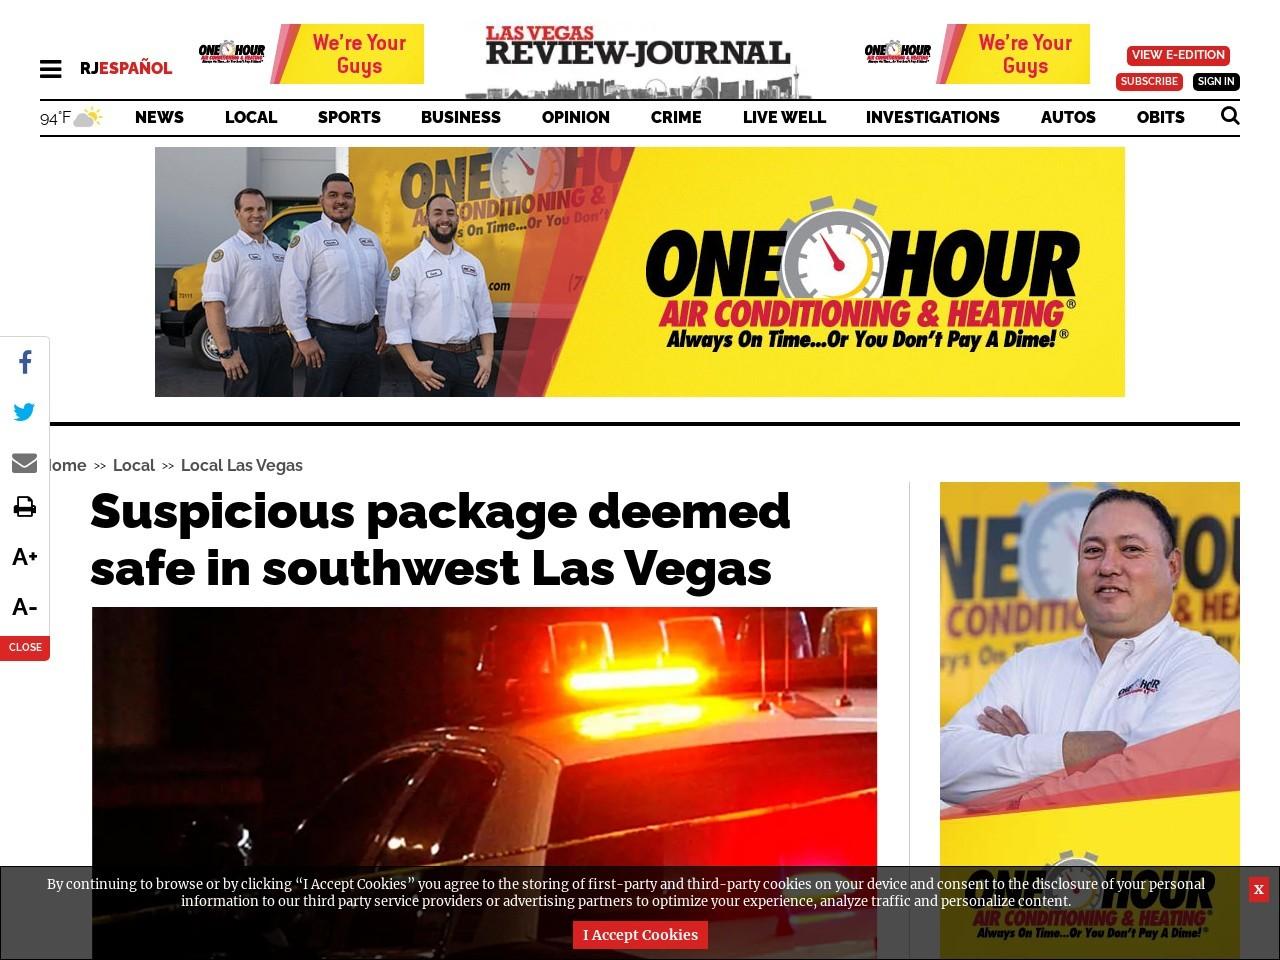 Suspicious package deemed safe in southwest Las Vegas